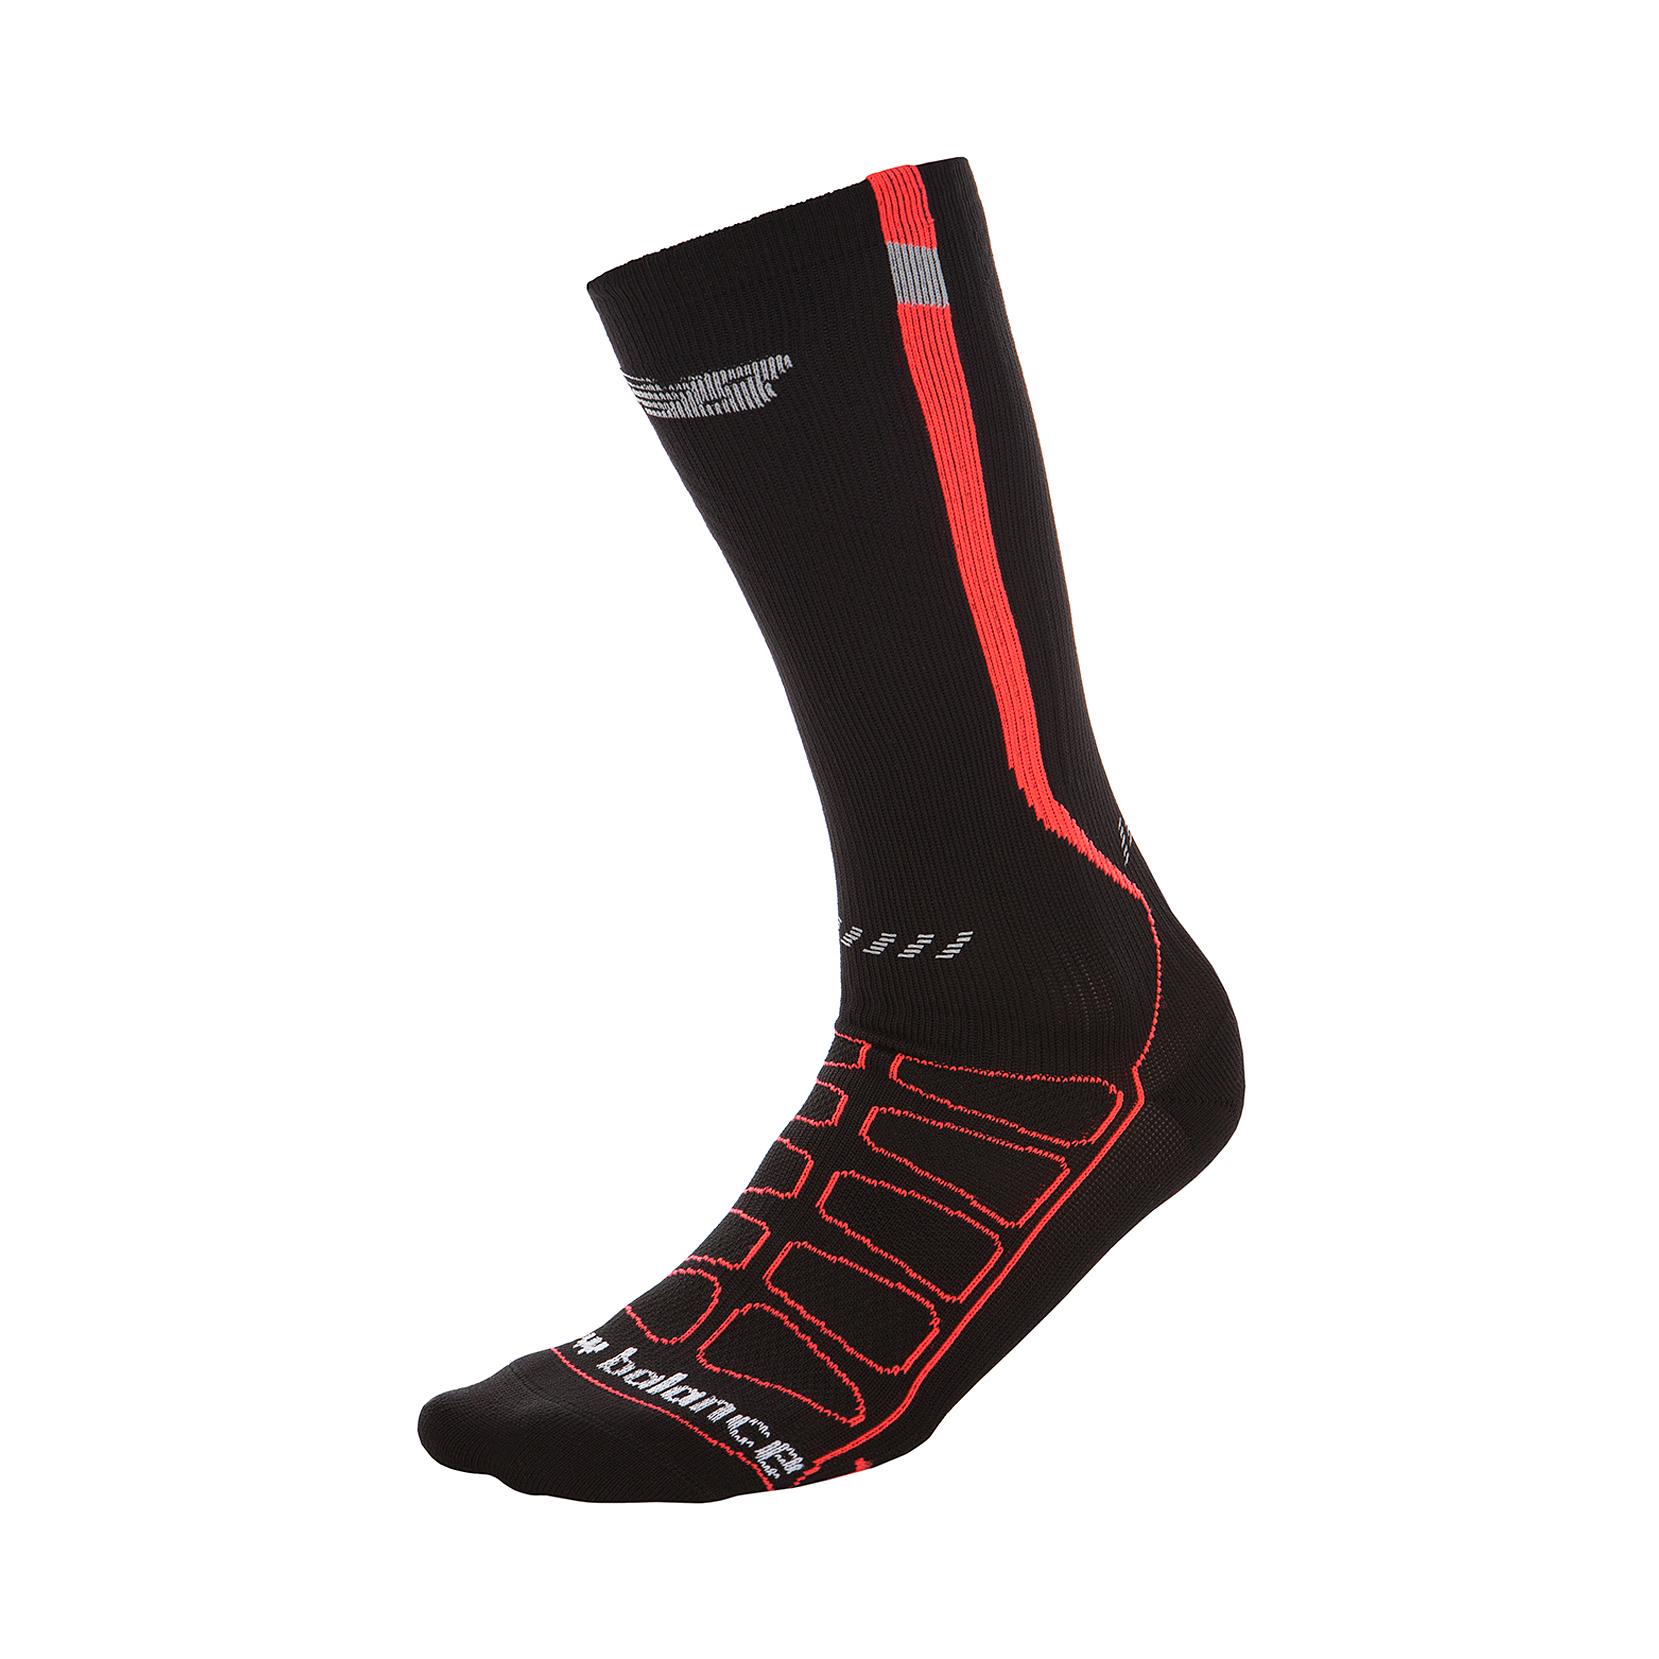 Шкарпетки REFLECTIVE COMPRESSION N393-1EU_BK/RD | New Balance